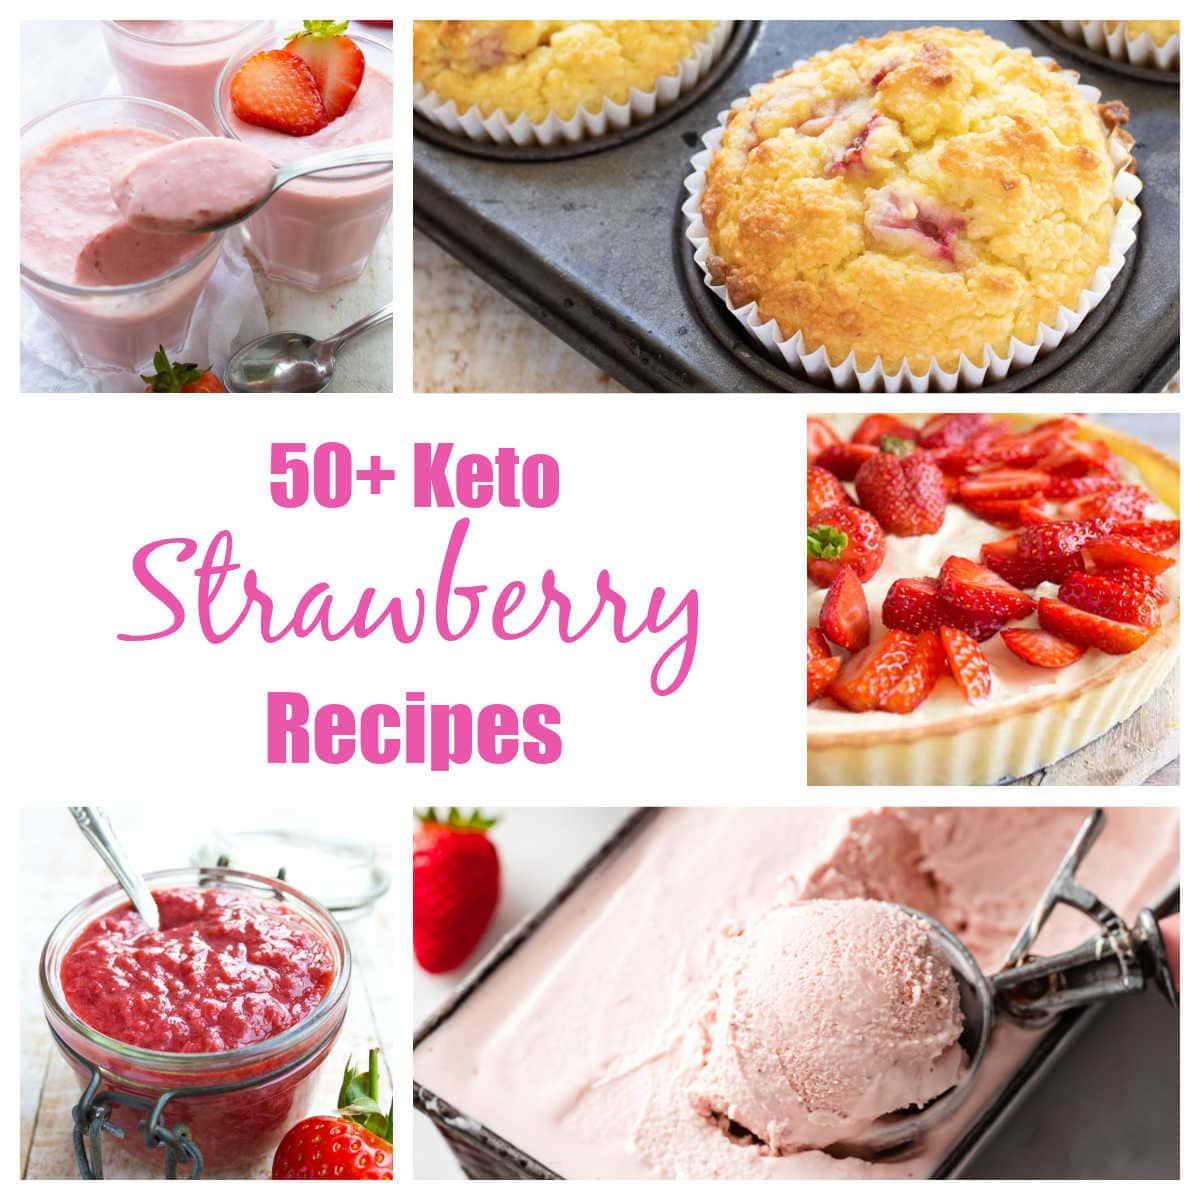 a selection of keto strawberry recipes